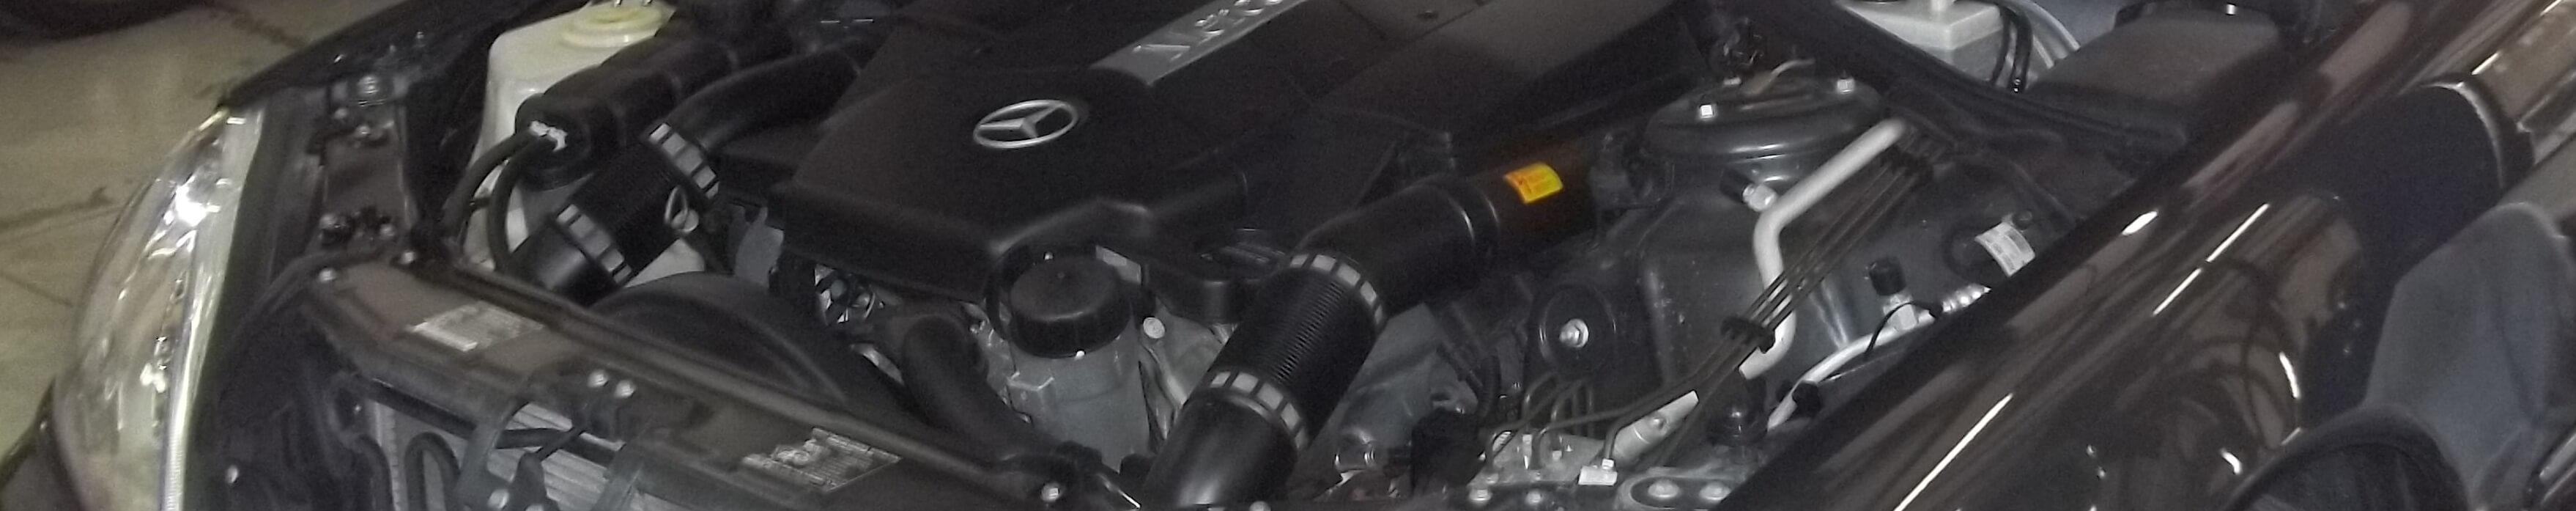 Mercedes-Benz Hose Repair Plano Allen Richardson McKinney Texas